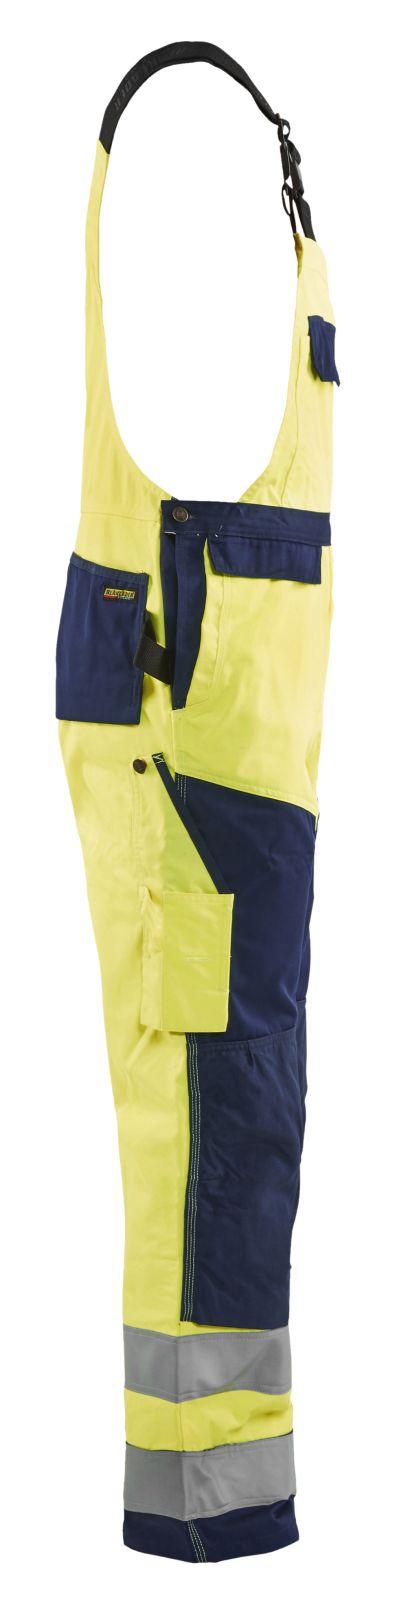 Blaklader Amerikaanse overalls 26601804 High Vis geel-marineblauw(3389)